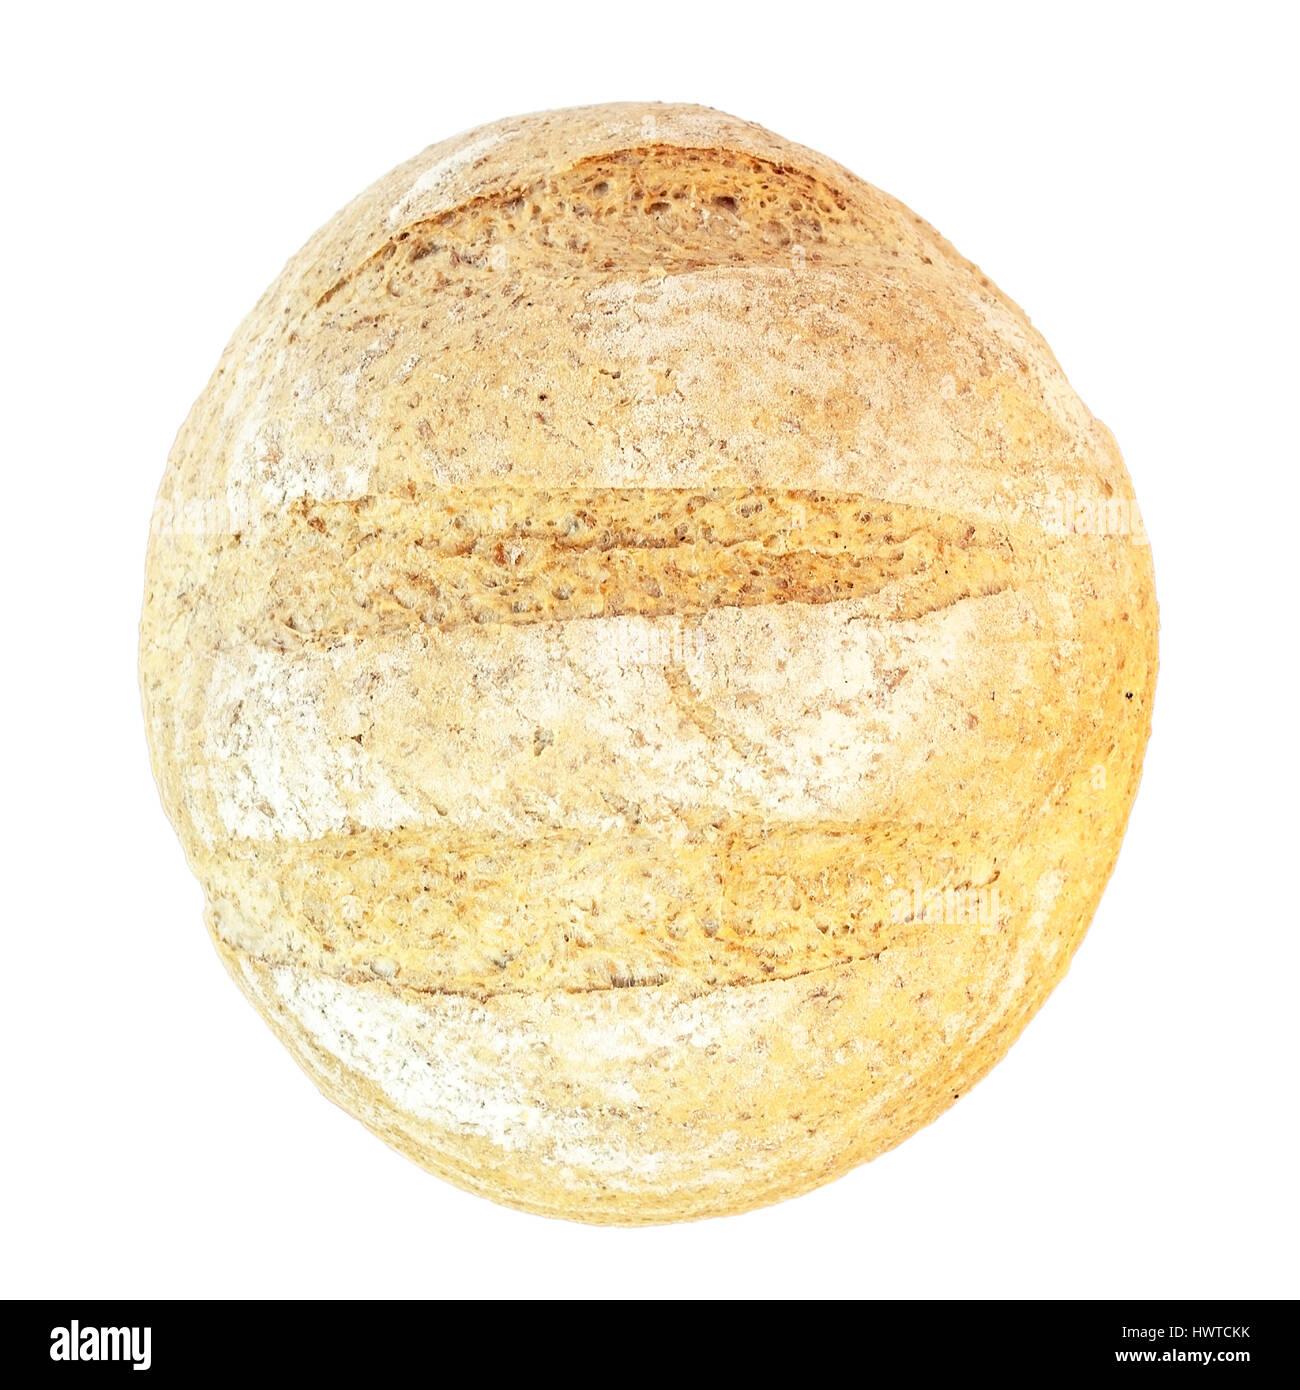 Dietary Homemade Bread - Stock Image